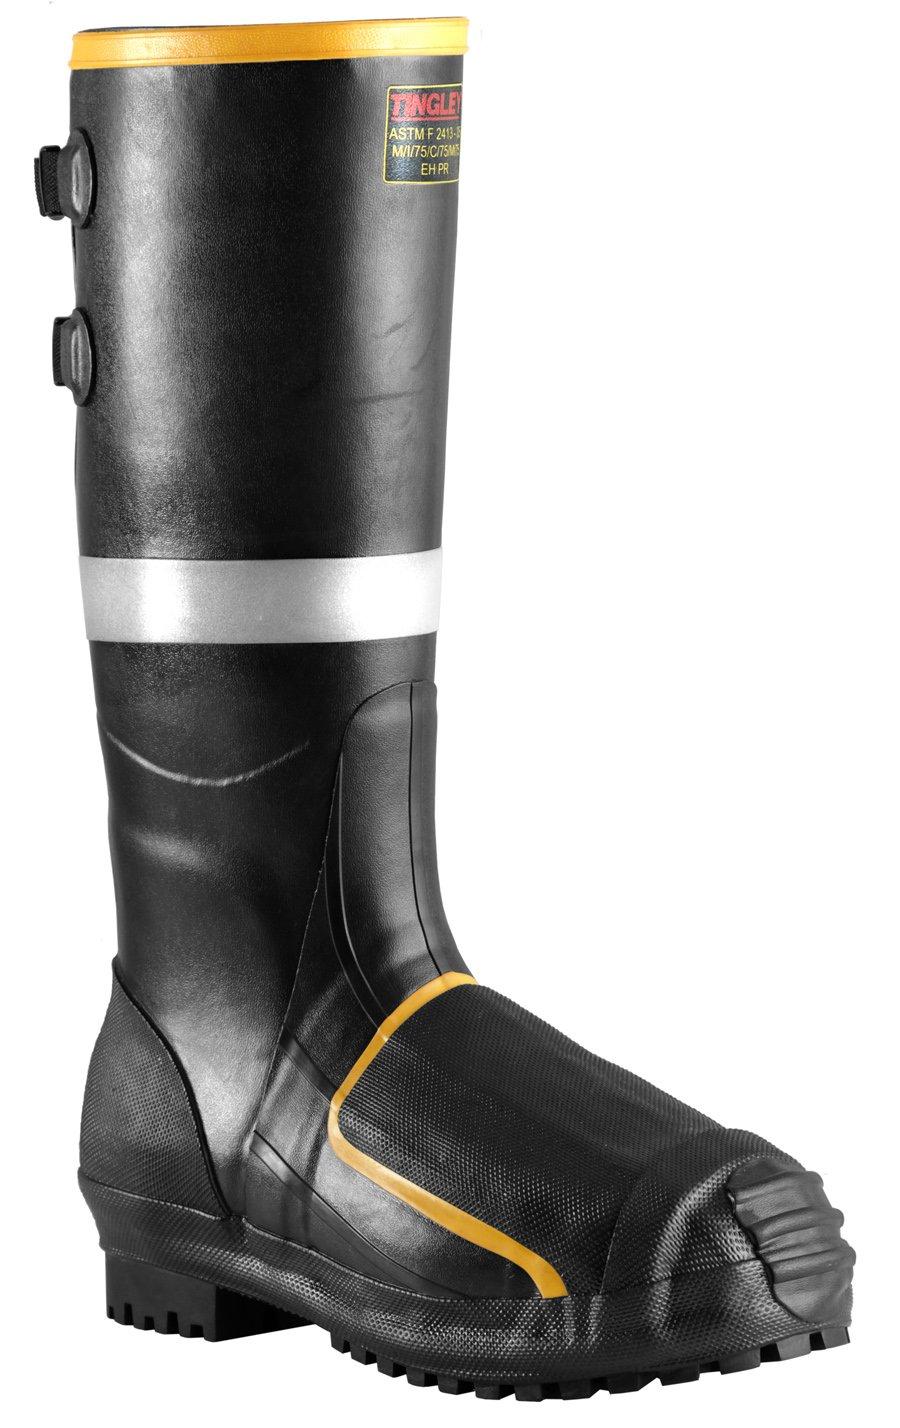 TINGLEY MB816B.15 16'' Steel Toe/Steel Midsole Metatarsal Boot, Size 15, Black